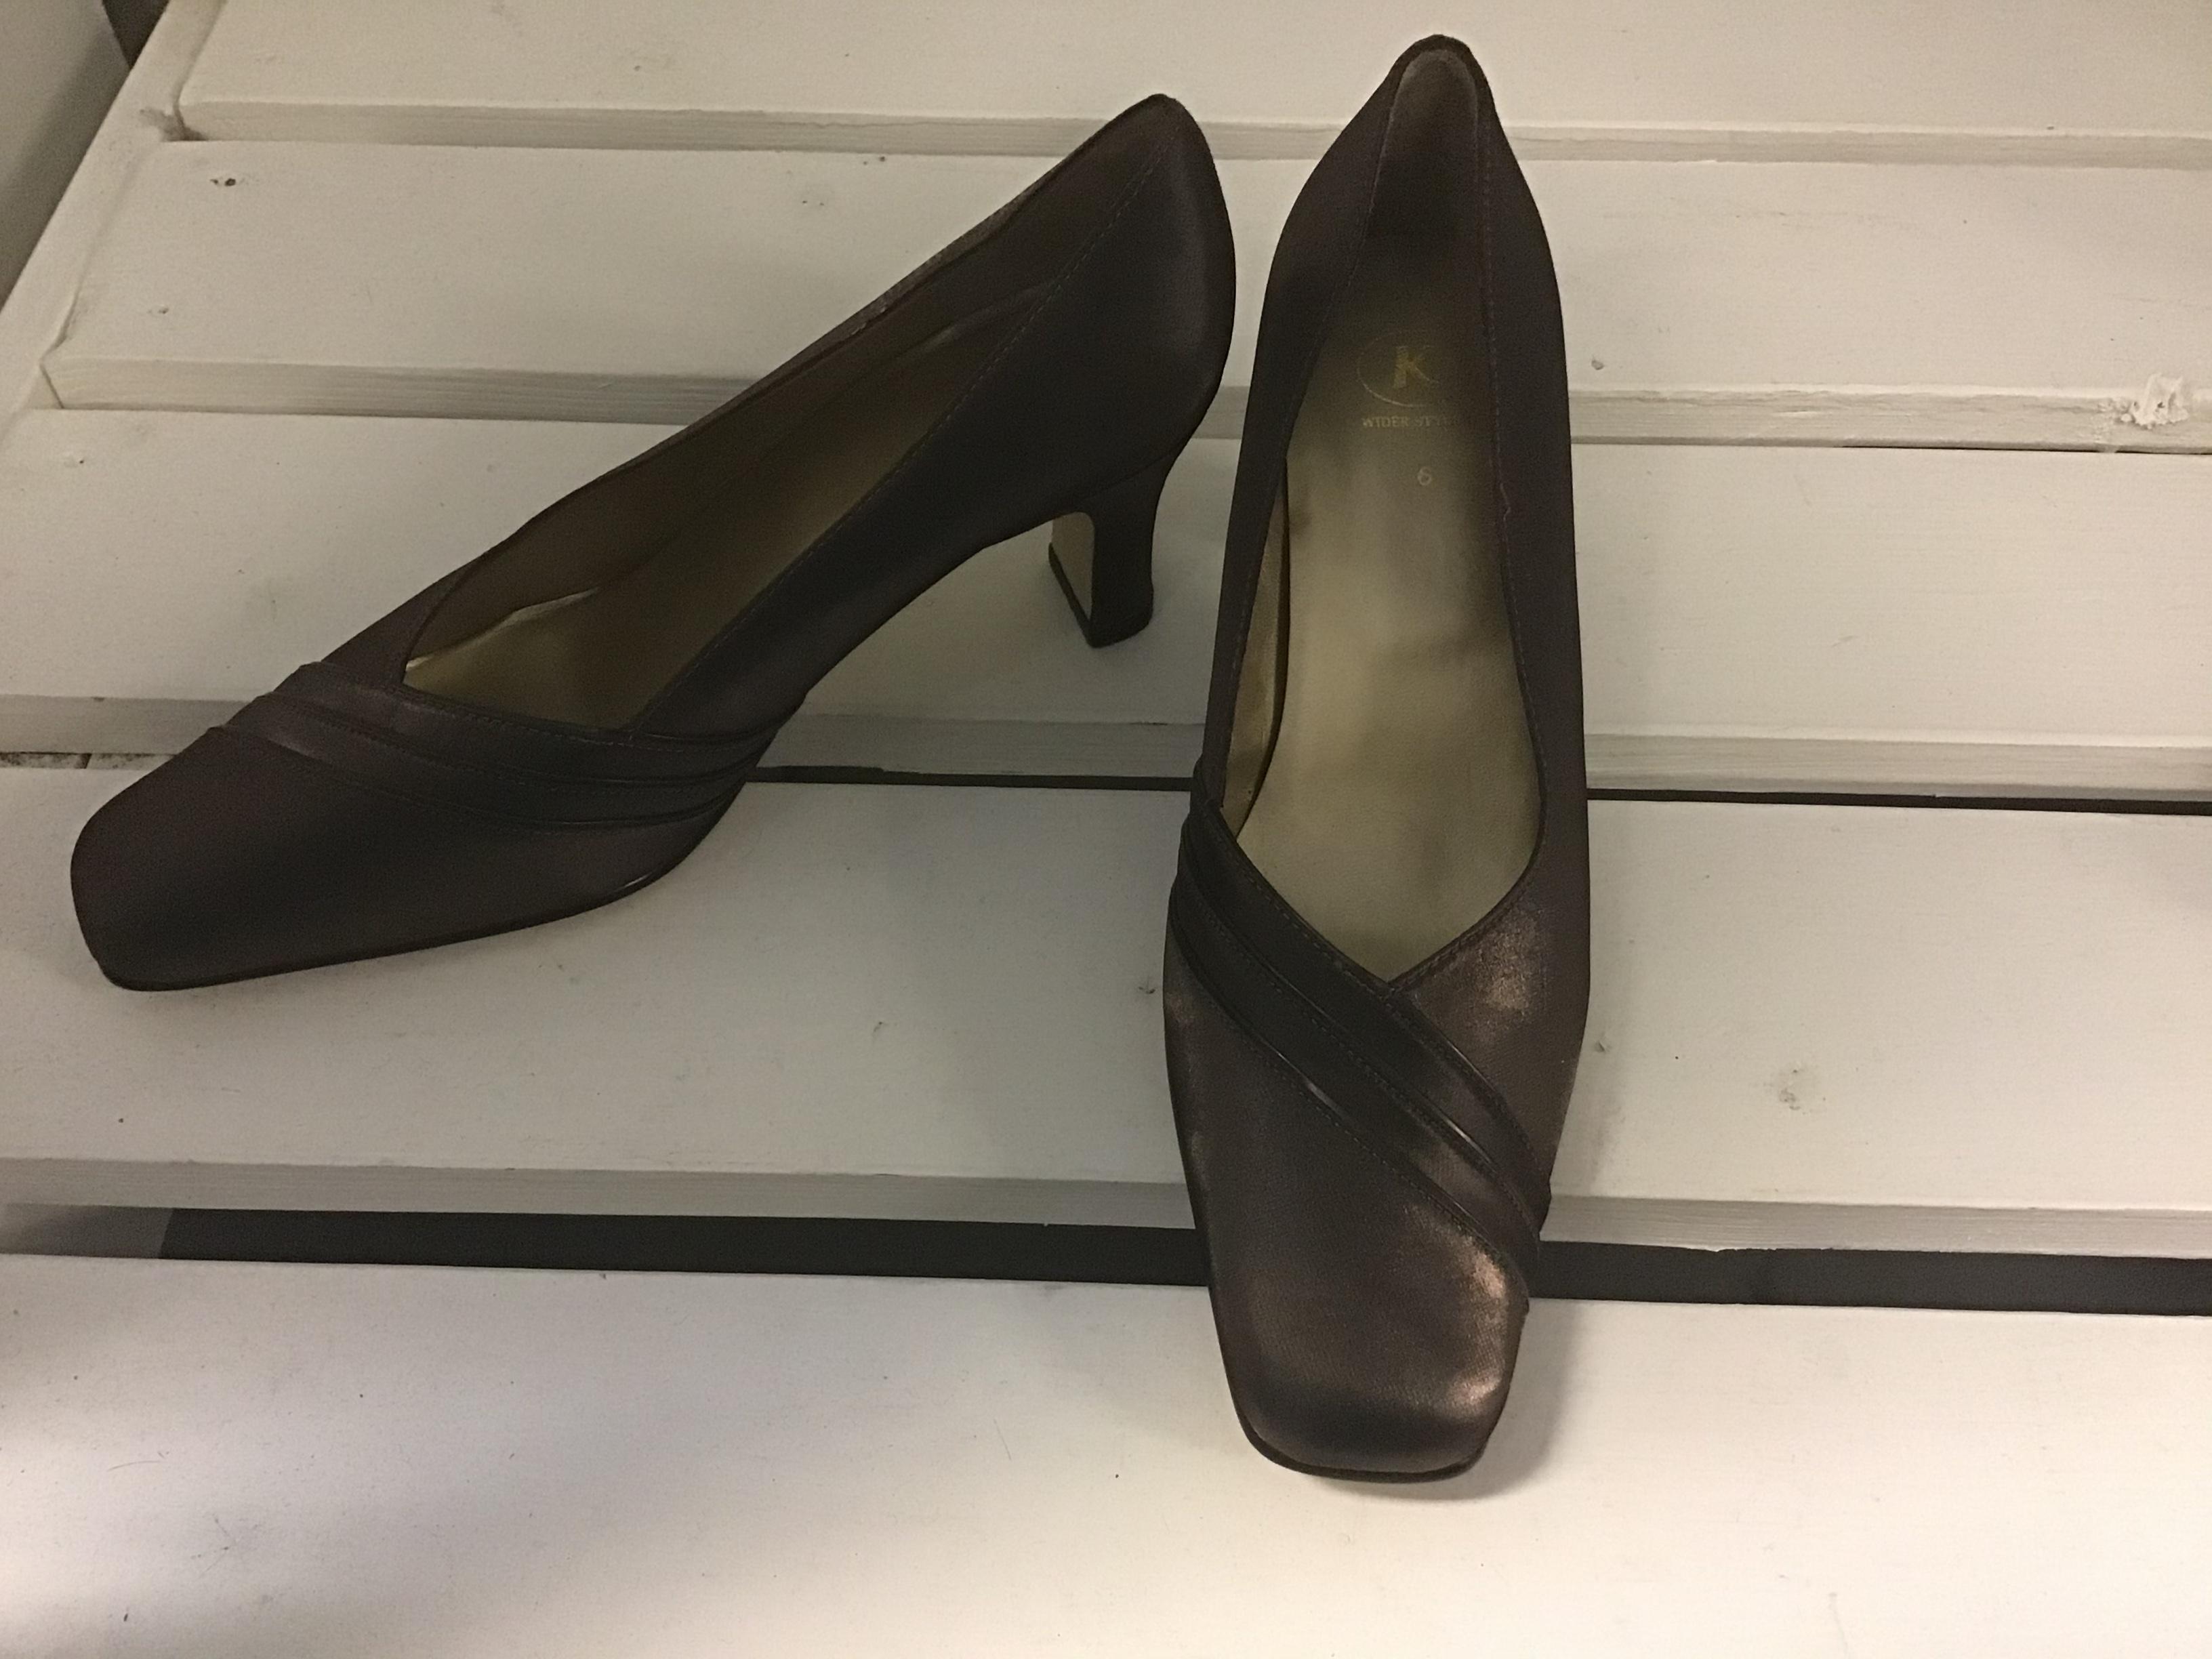 Kengät, koko 6, uudet